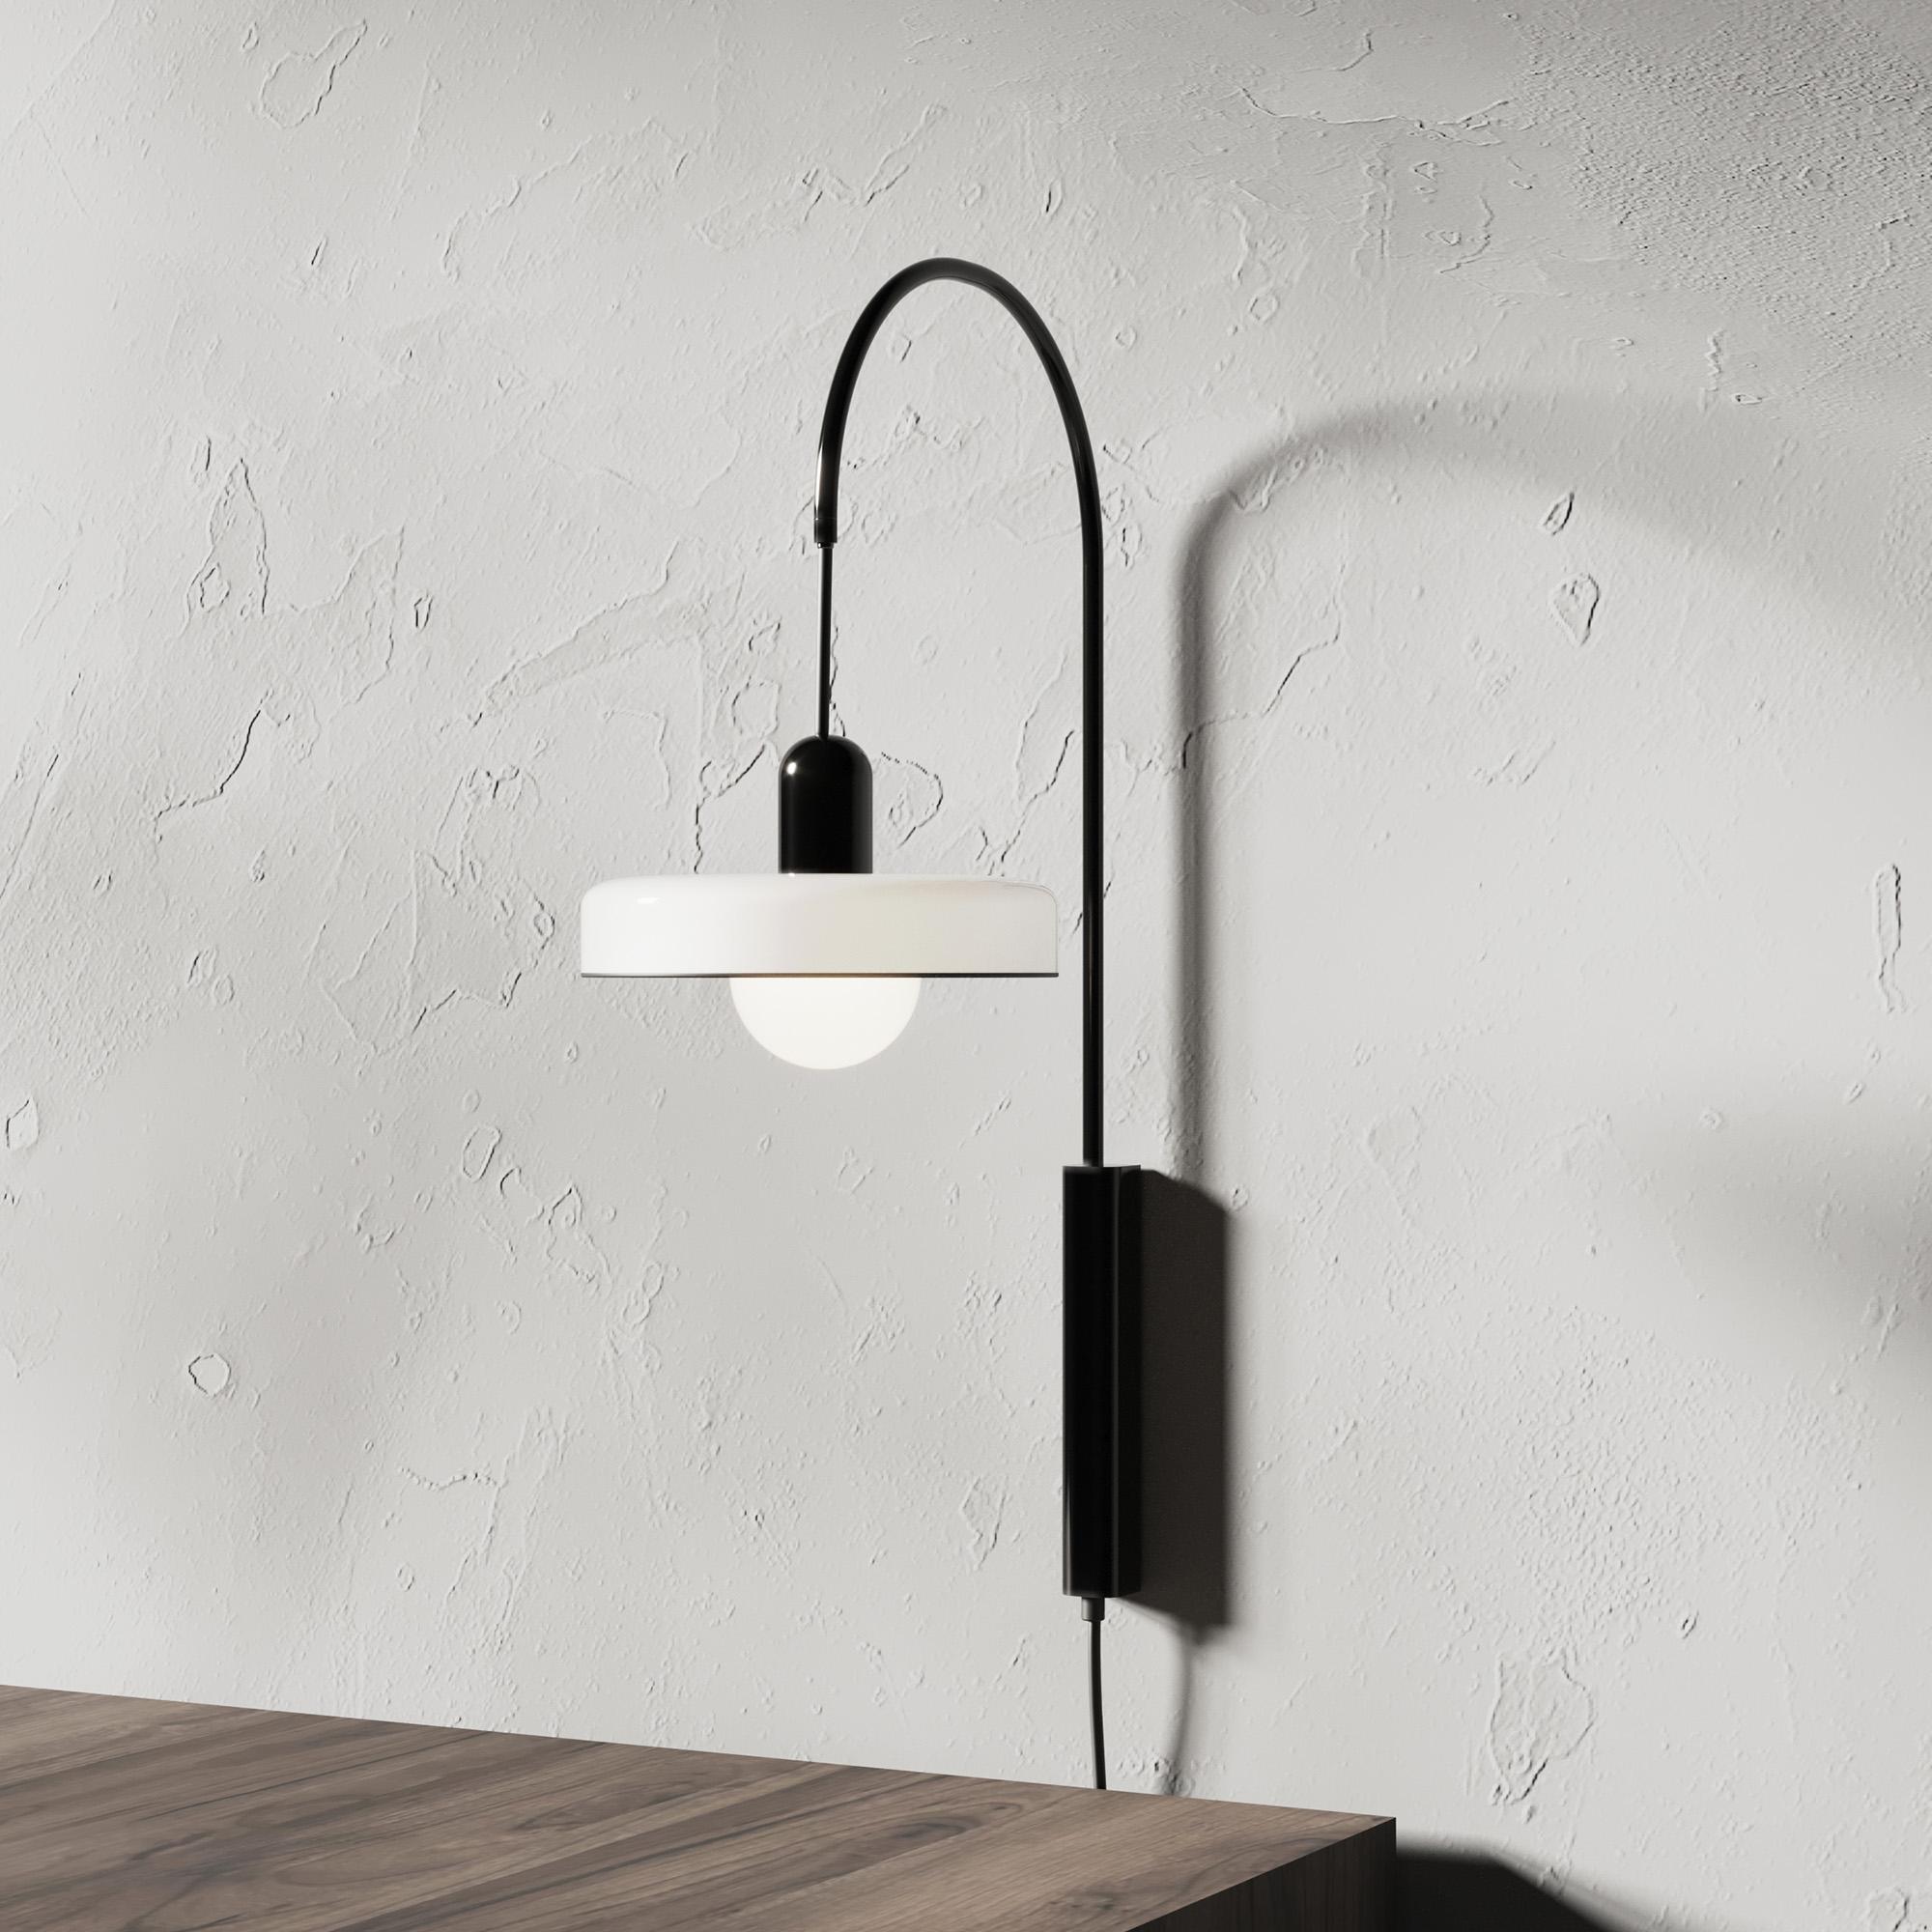 NEEN DESIGN : 每日設計 | 壁燈